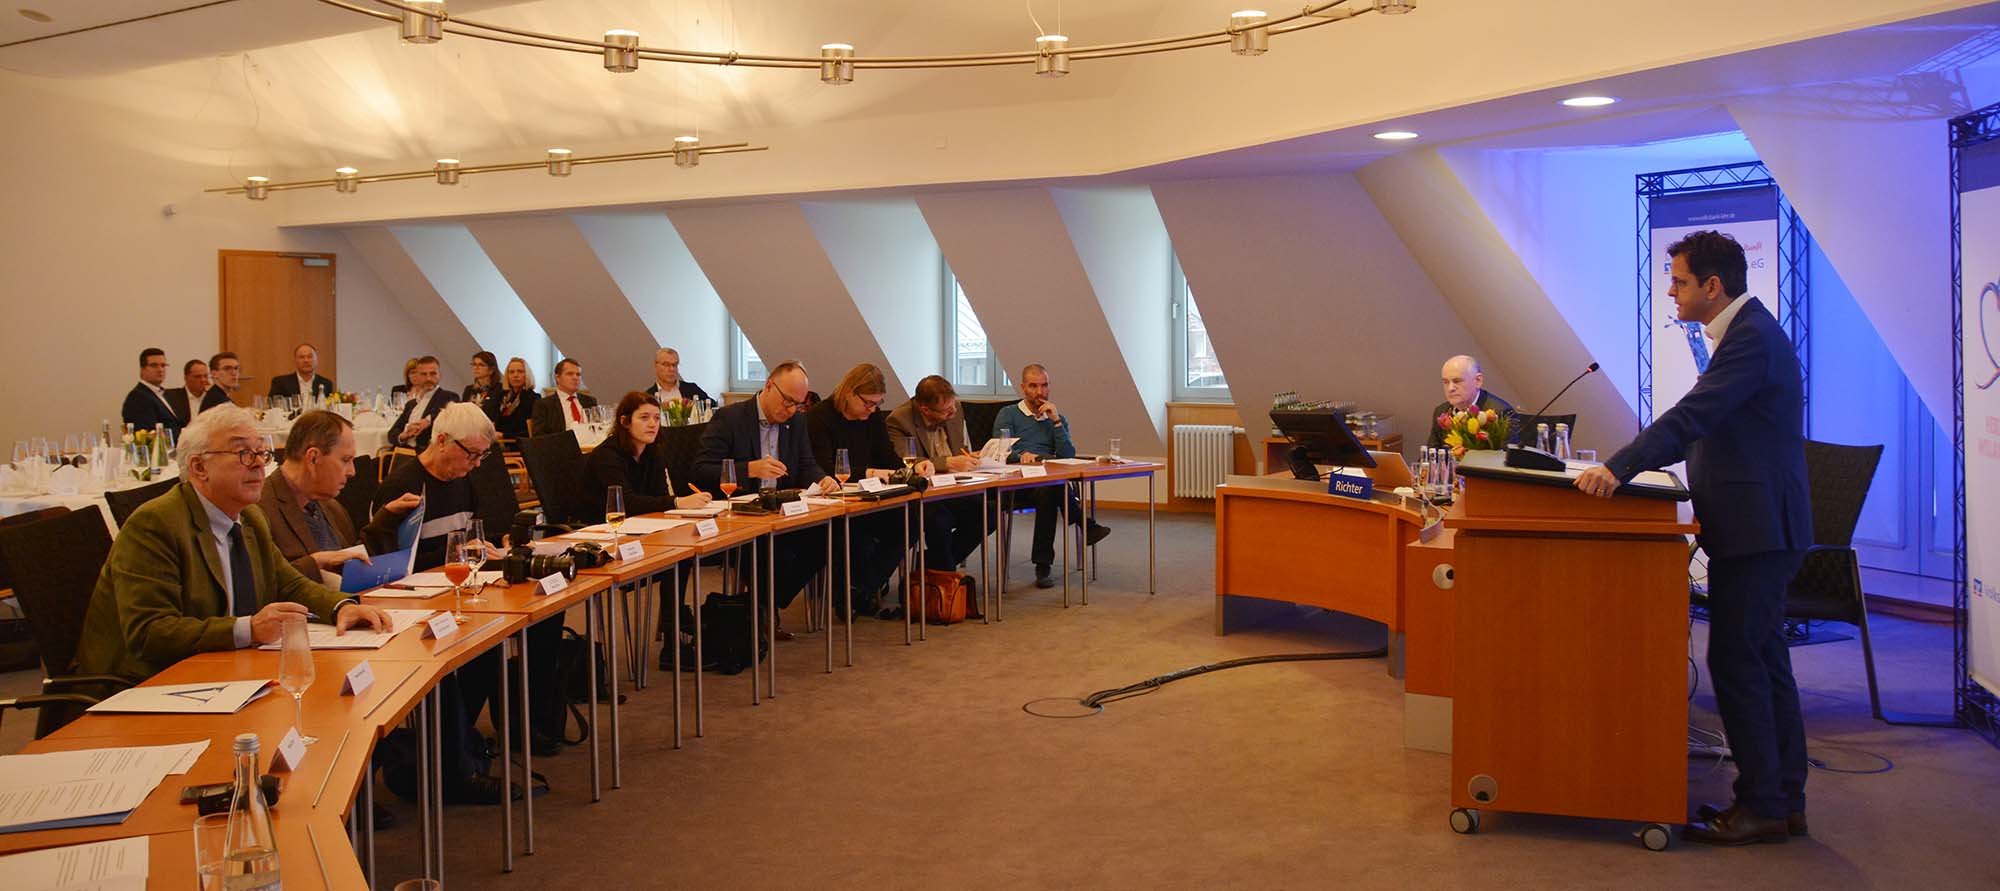 2020-1-31-LR-Lahr-hps-Volksbank-Bilanzpressekonferenz-DSC_2319 2